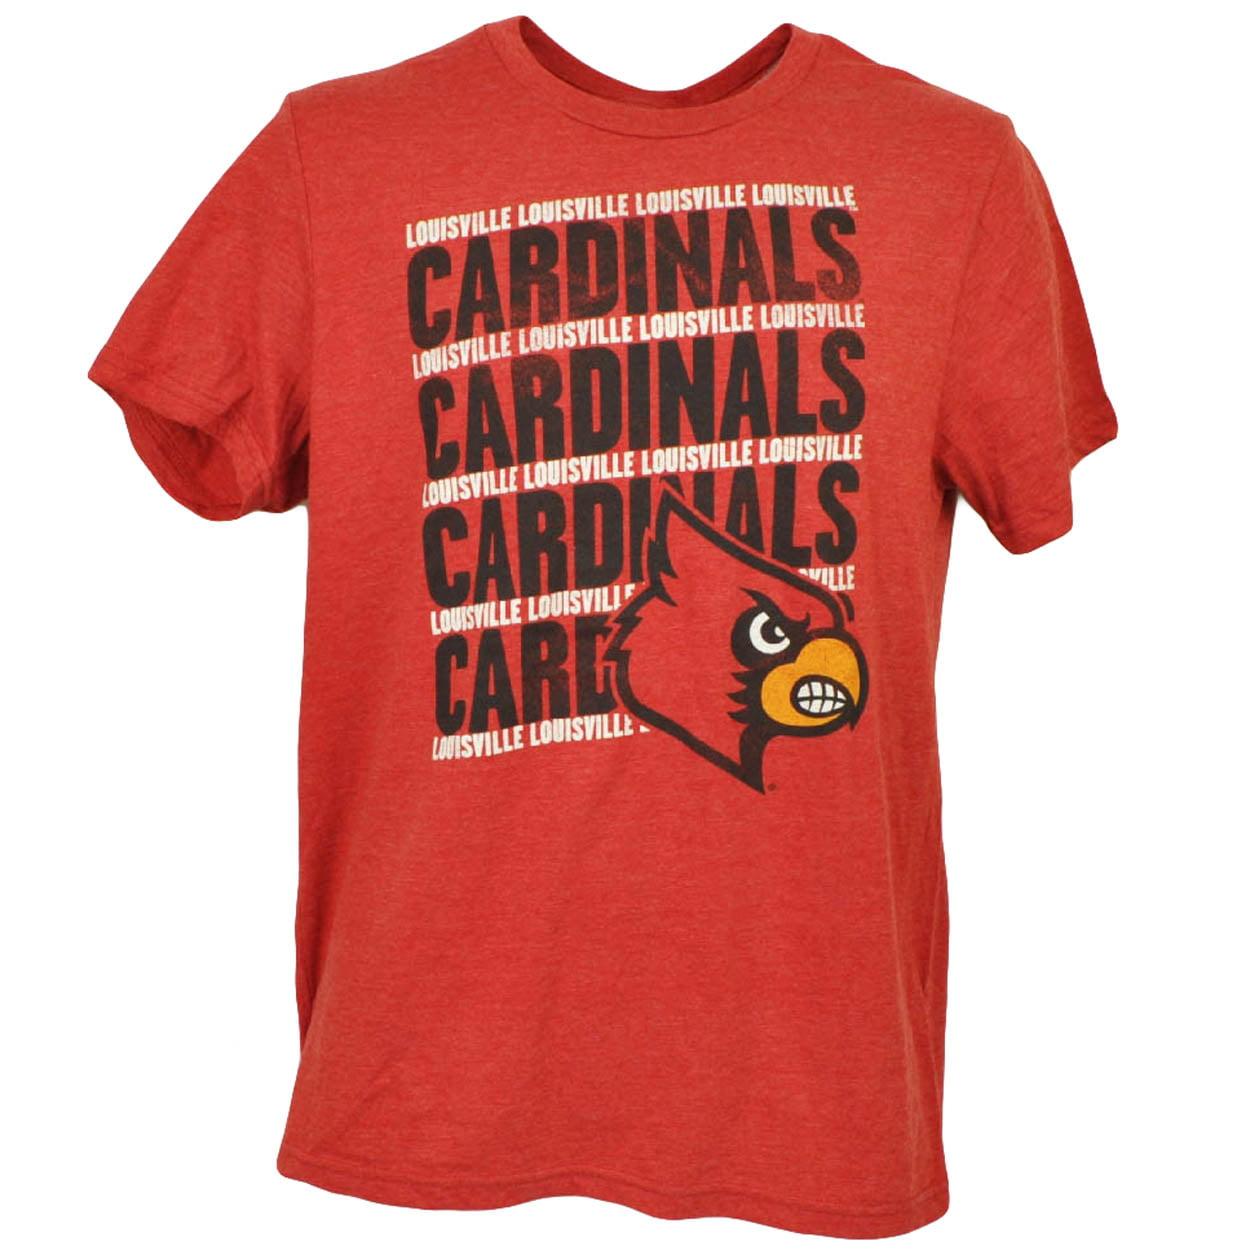 NCAA Louisville Cardinals Tshirt Tee Short Sleeve Crew Neck Mens Red Sports XL